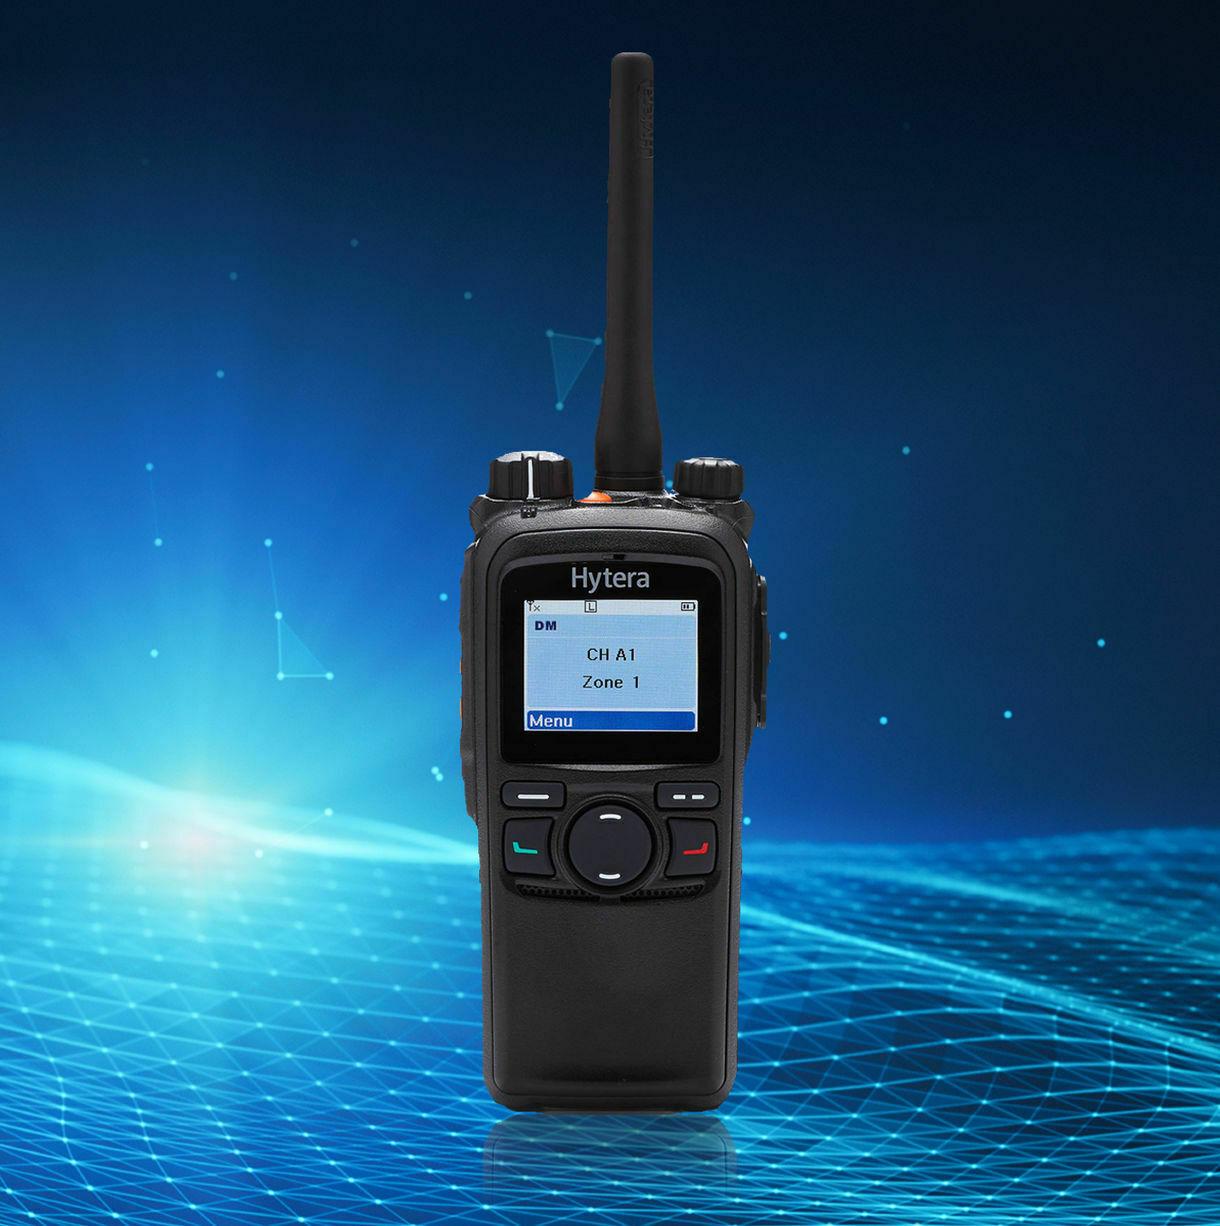 0000 hytera products blue PD755 9e59e0534cf8ef1f33324ce24984d979